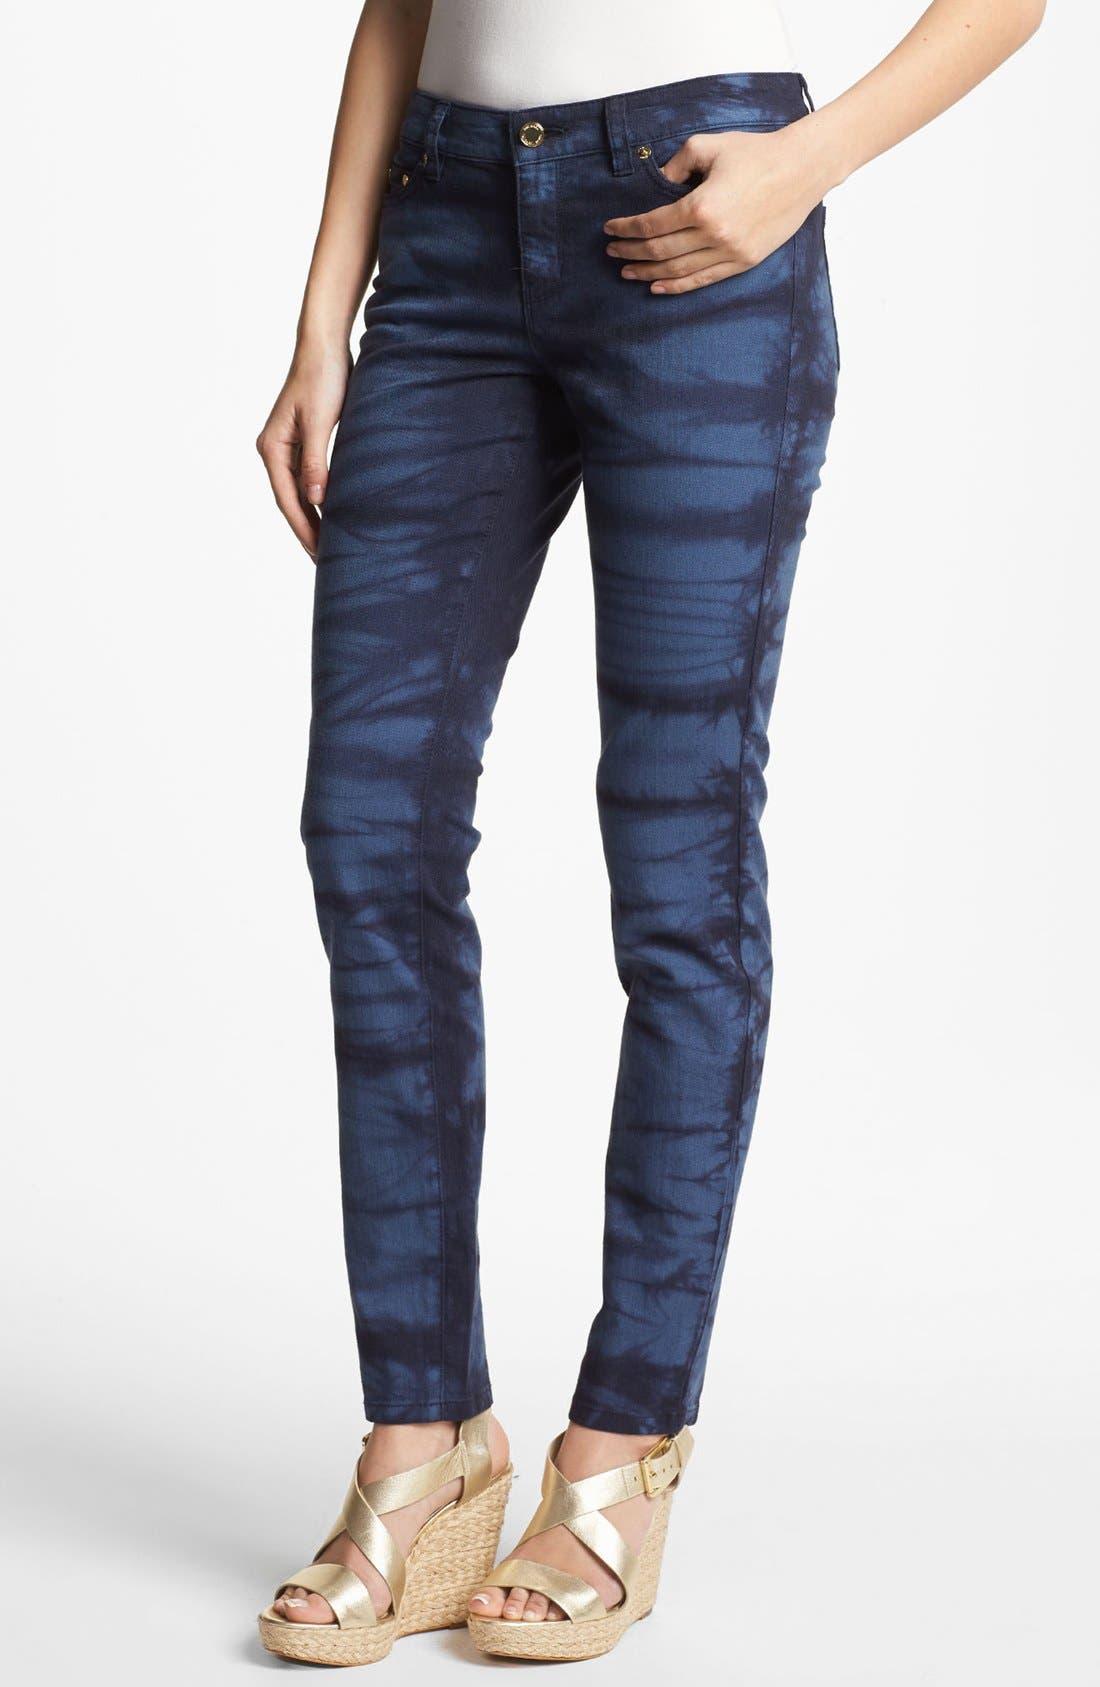 Alternate Image 1 Selected - MICHAEL Michael Kors Tie Dye Print Jeans